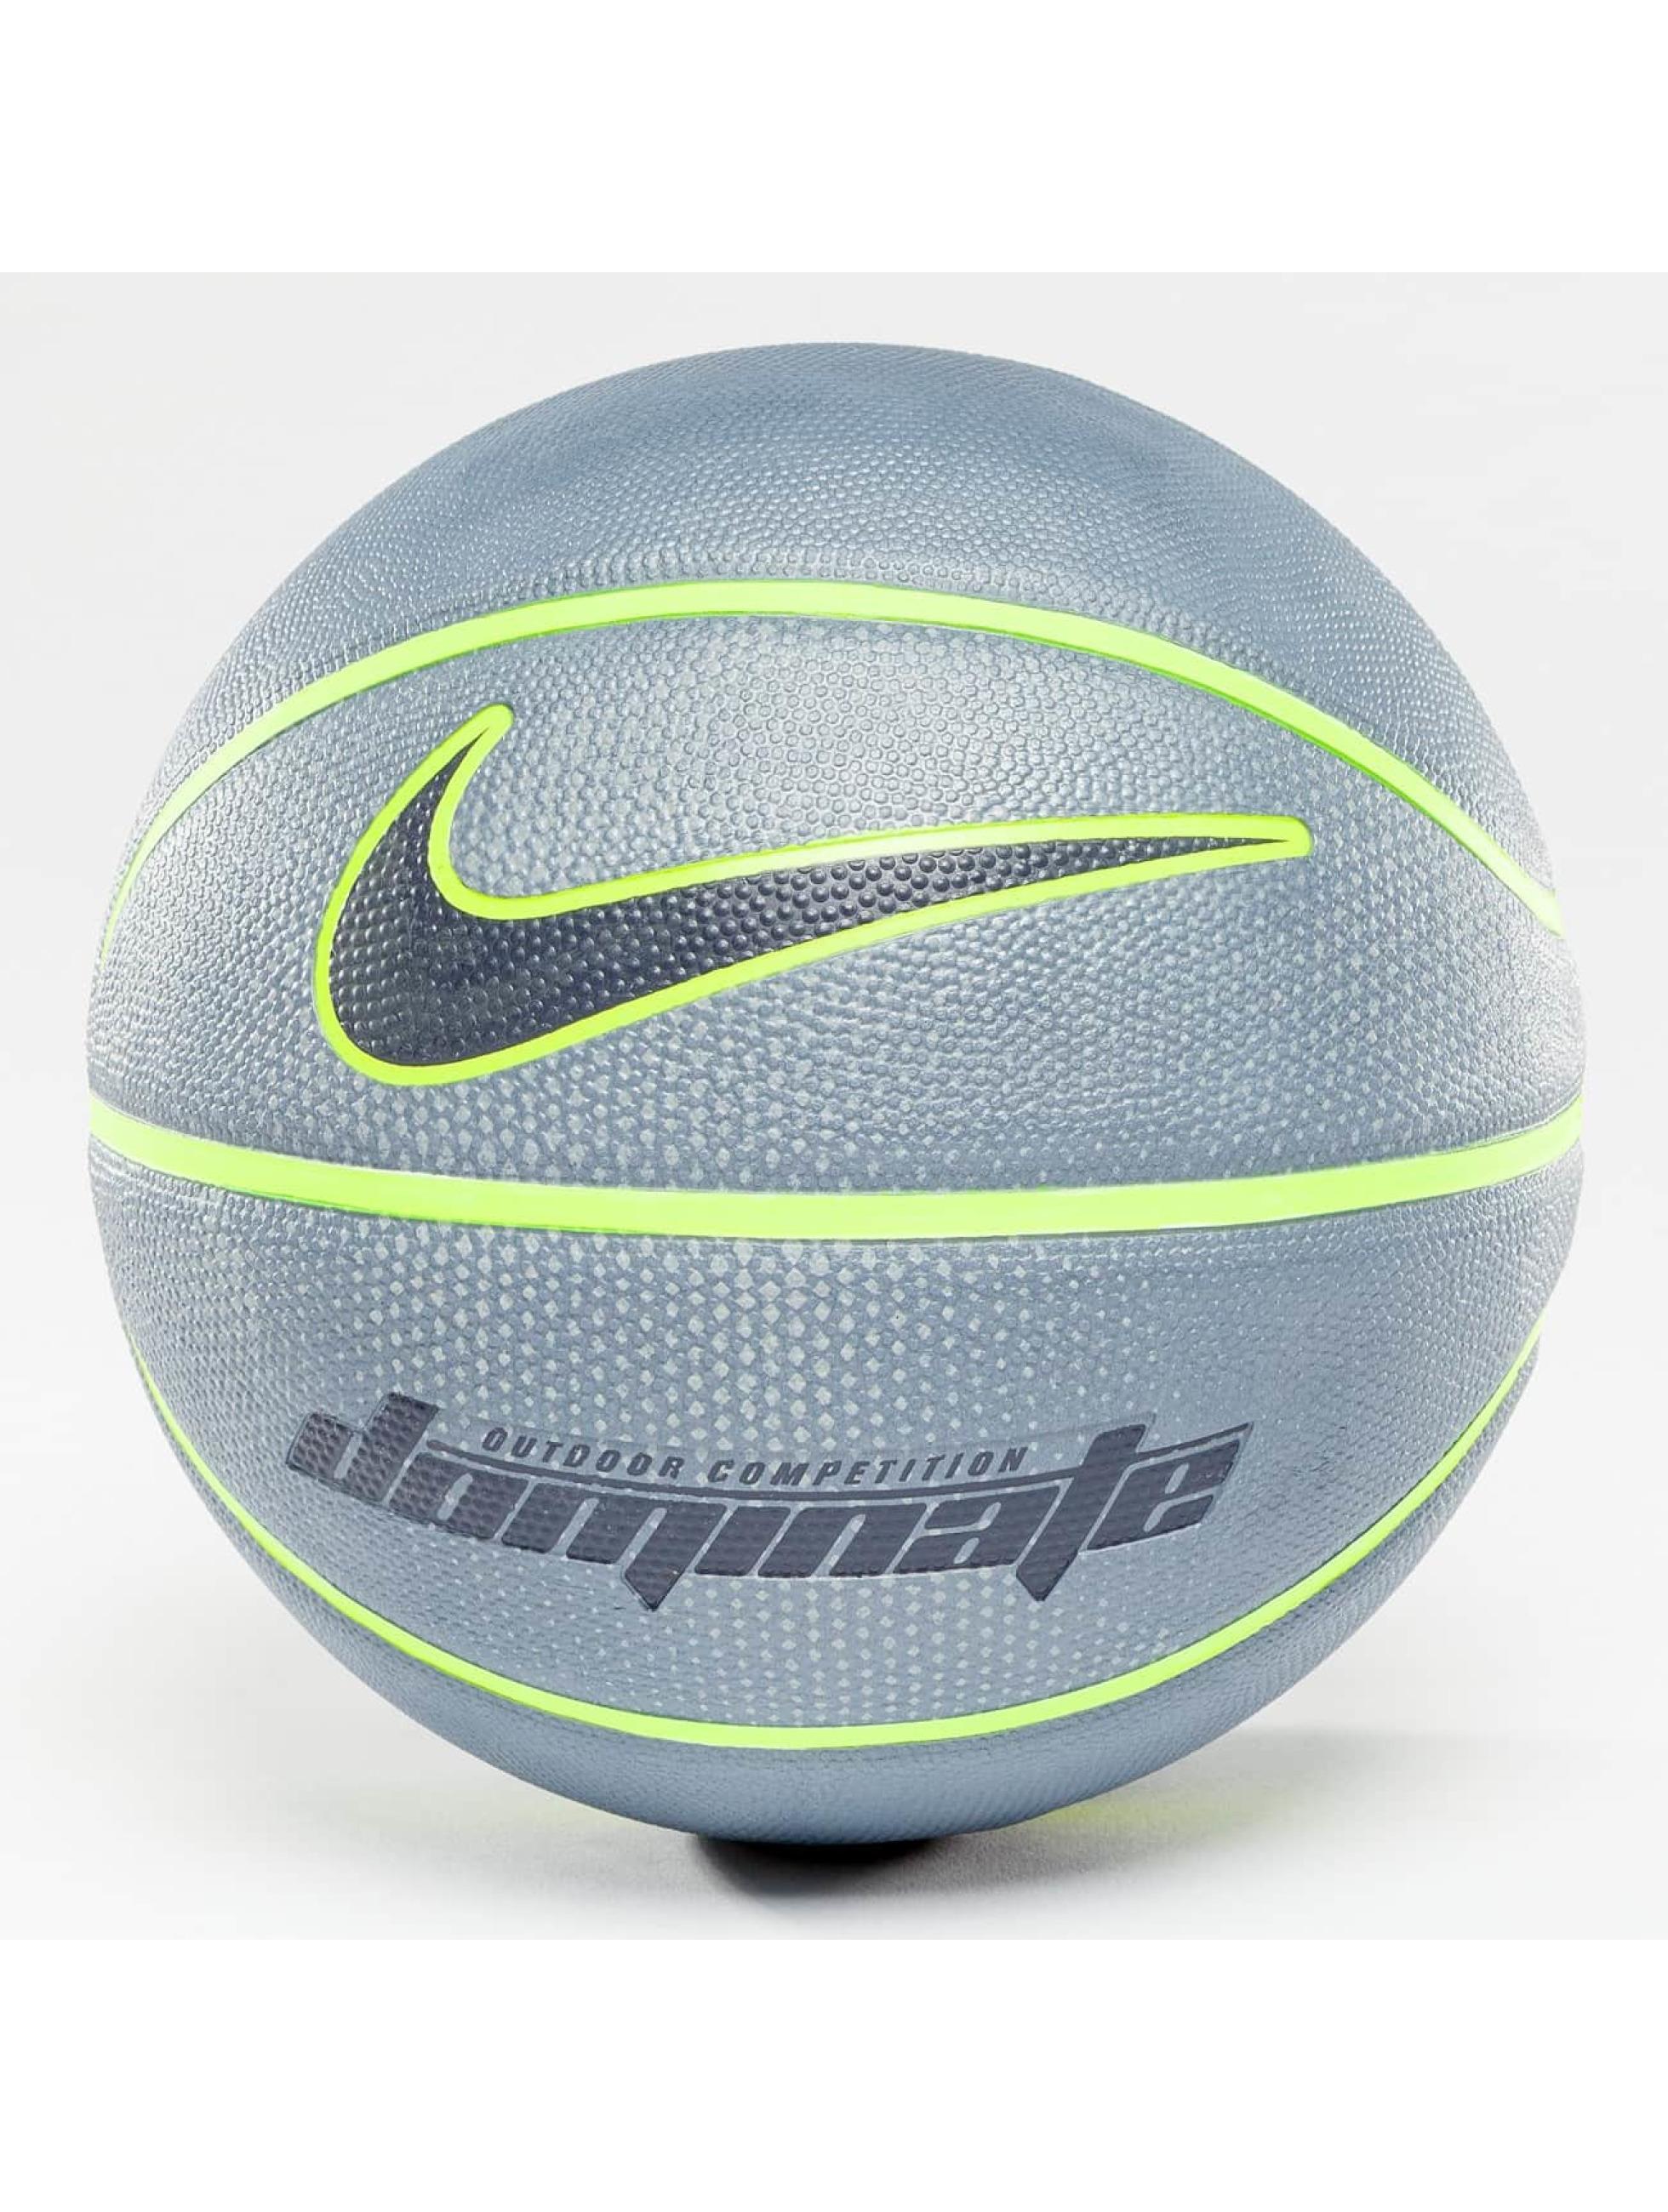 Nike Performance Männer,Frauen,Kinder Ball Dominate 8P in blau